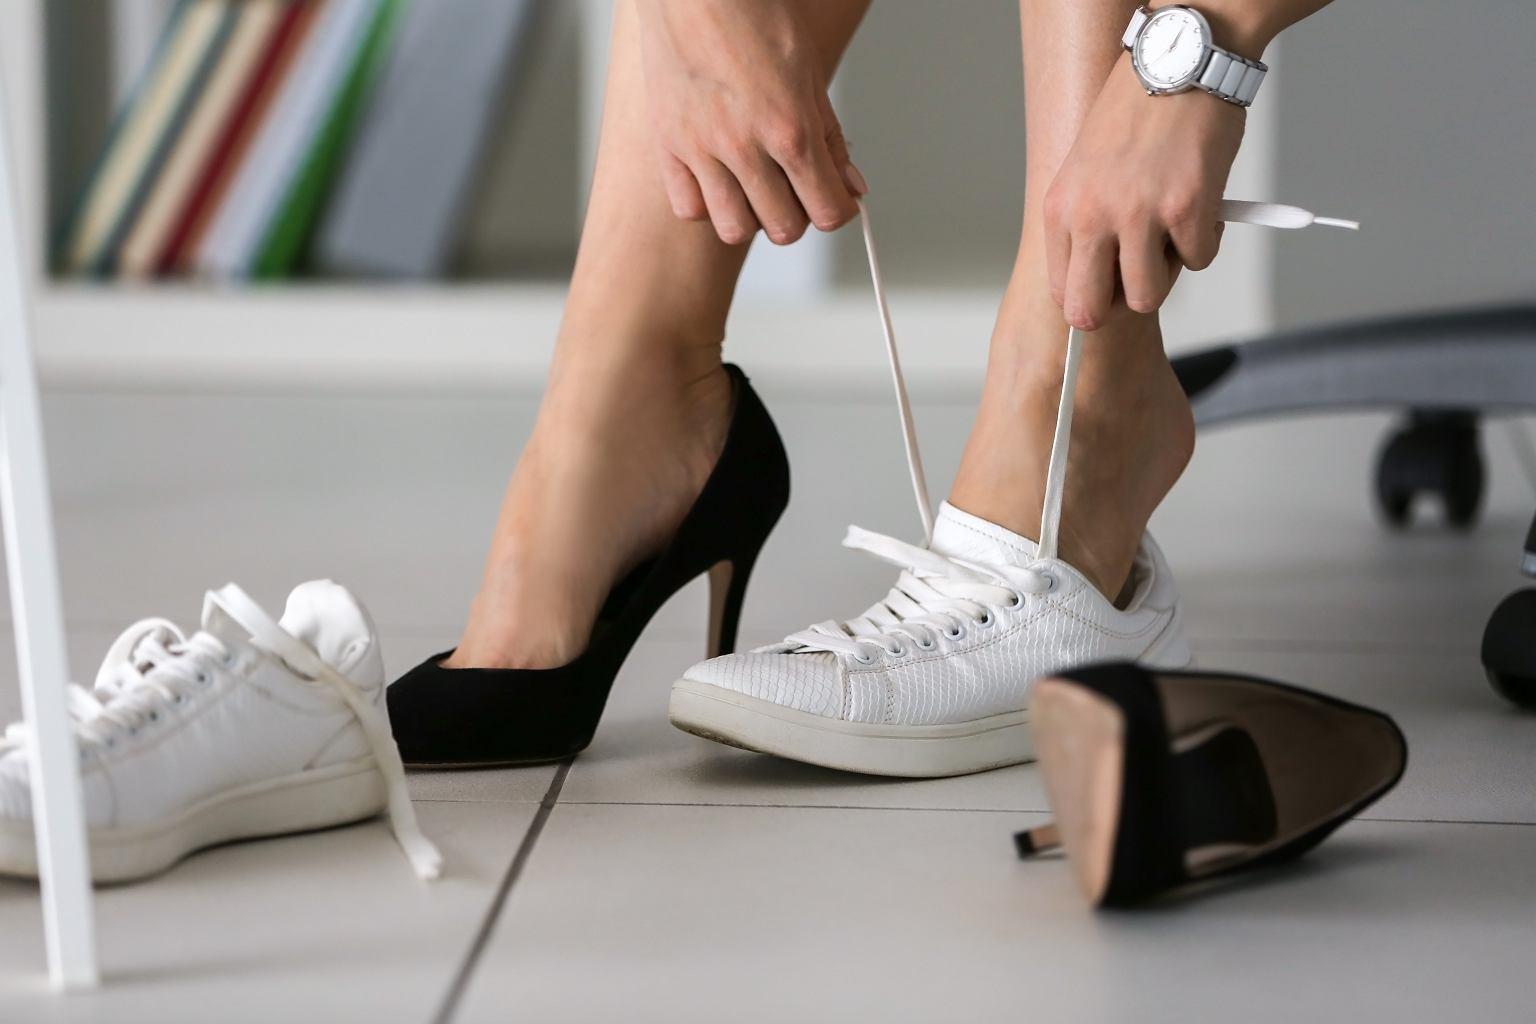 Trendy 2020: sportowe buty na wiosnę. Te modele musisz mieć